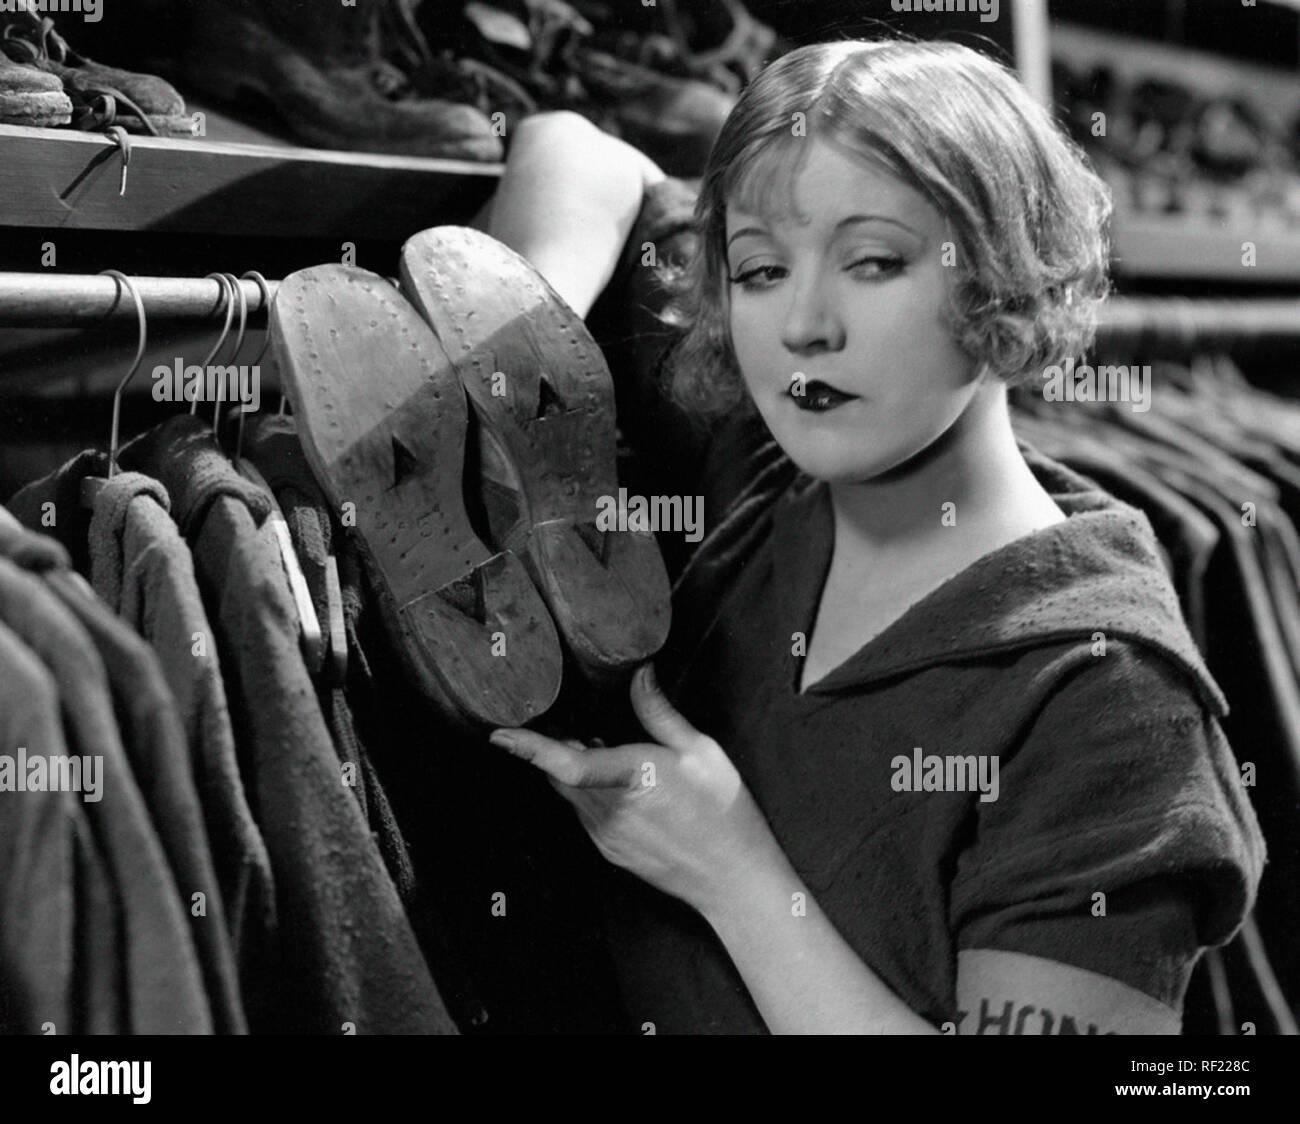 Prod DB © C.B. DeMille Productions / DR LES DAMNES DU COEUR THE GODLESS GIRL de Cecil B. DeMille 1929 USA Marie Prevost. film muet; silent film; chaussures; shoes - Stock Image